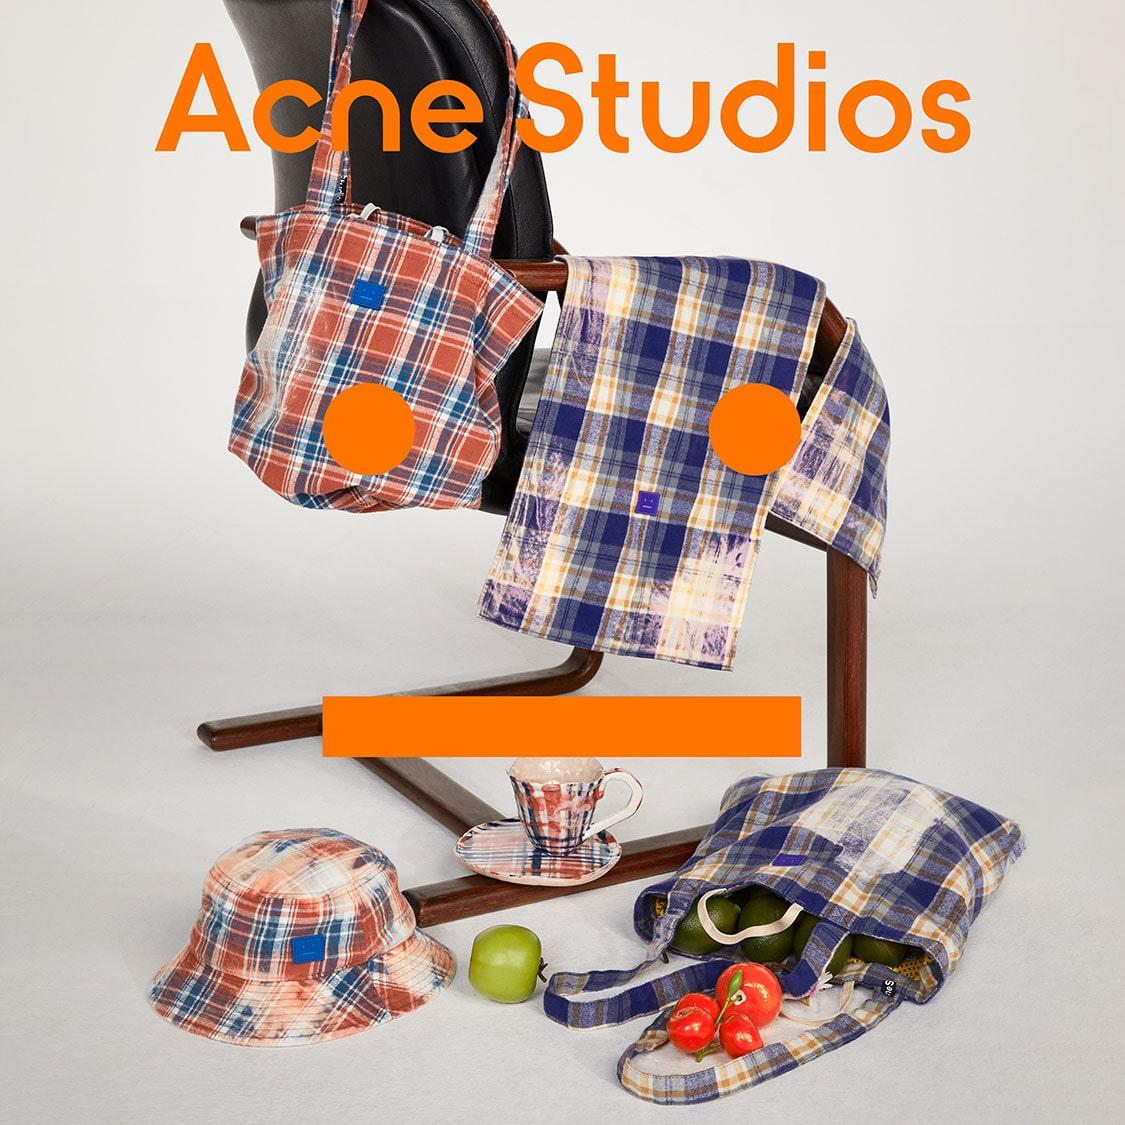 Acne Studios<br>FACE 2021 Fall Collection